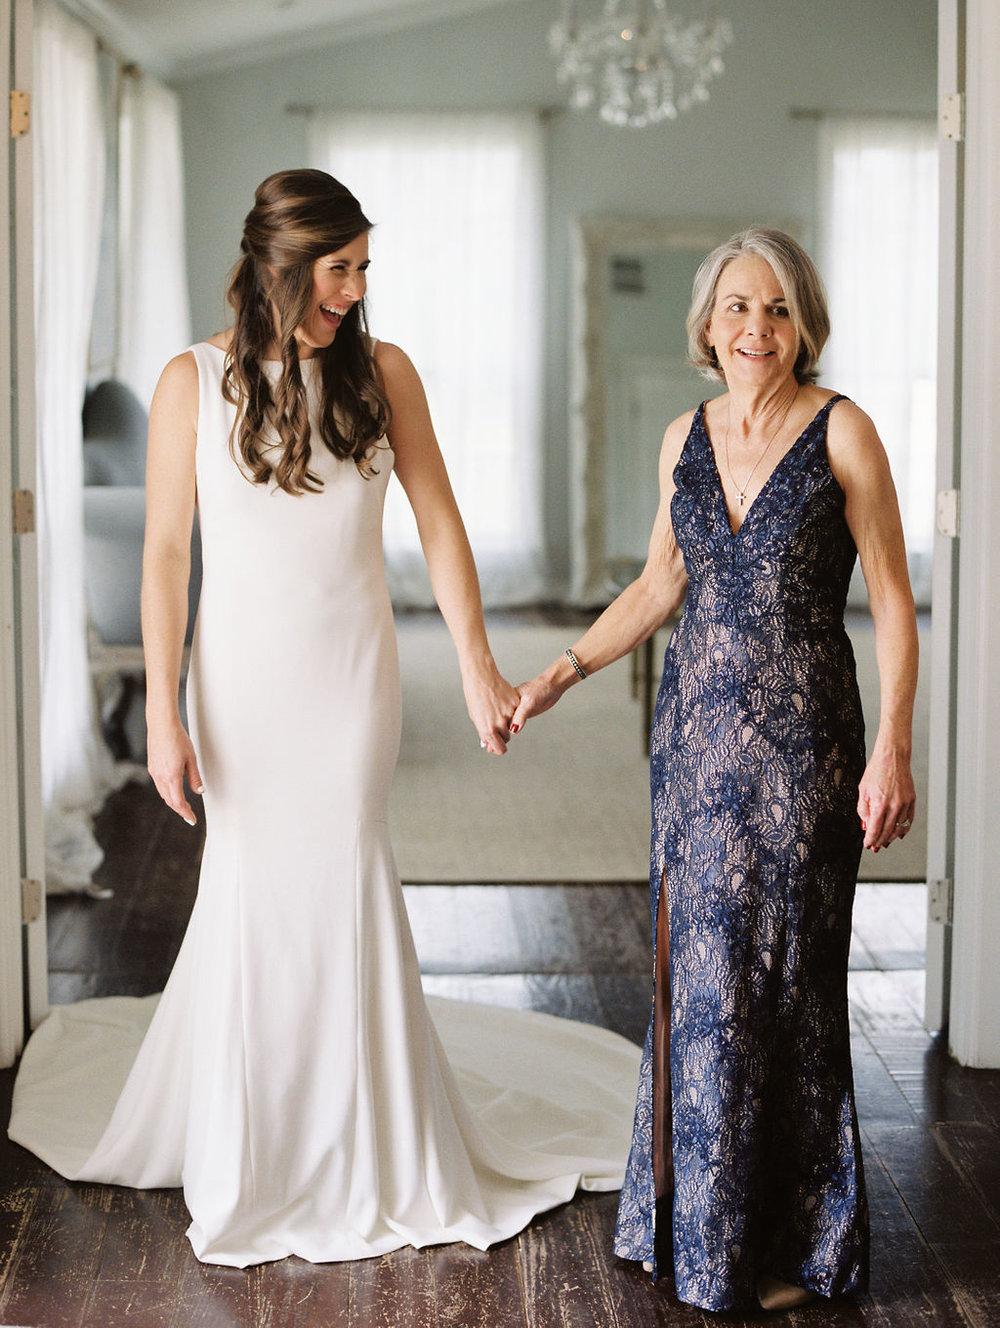 Austin-Texas-Wedding-Photographer-Addison-Grove-Film-8.jpg